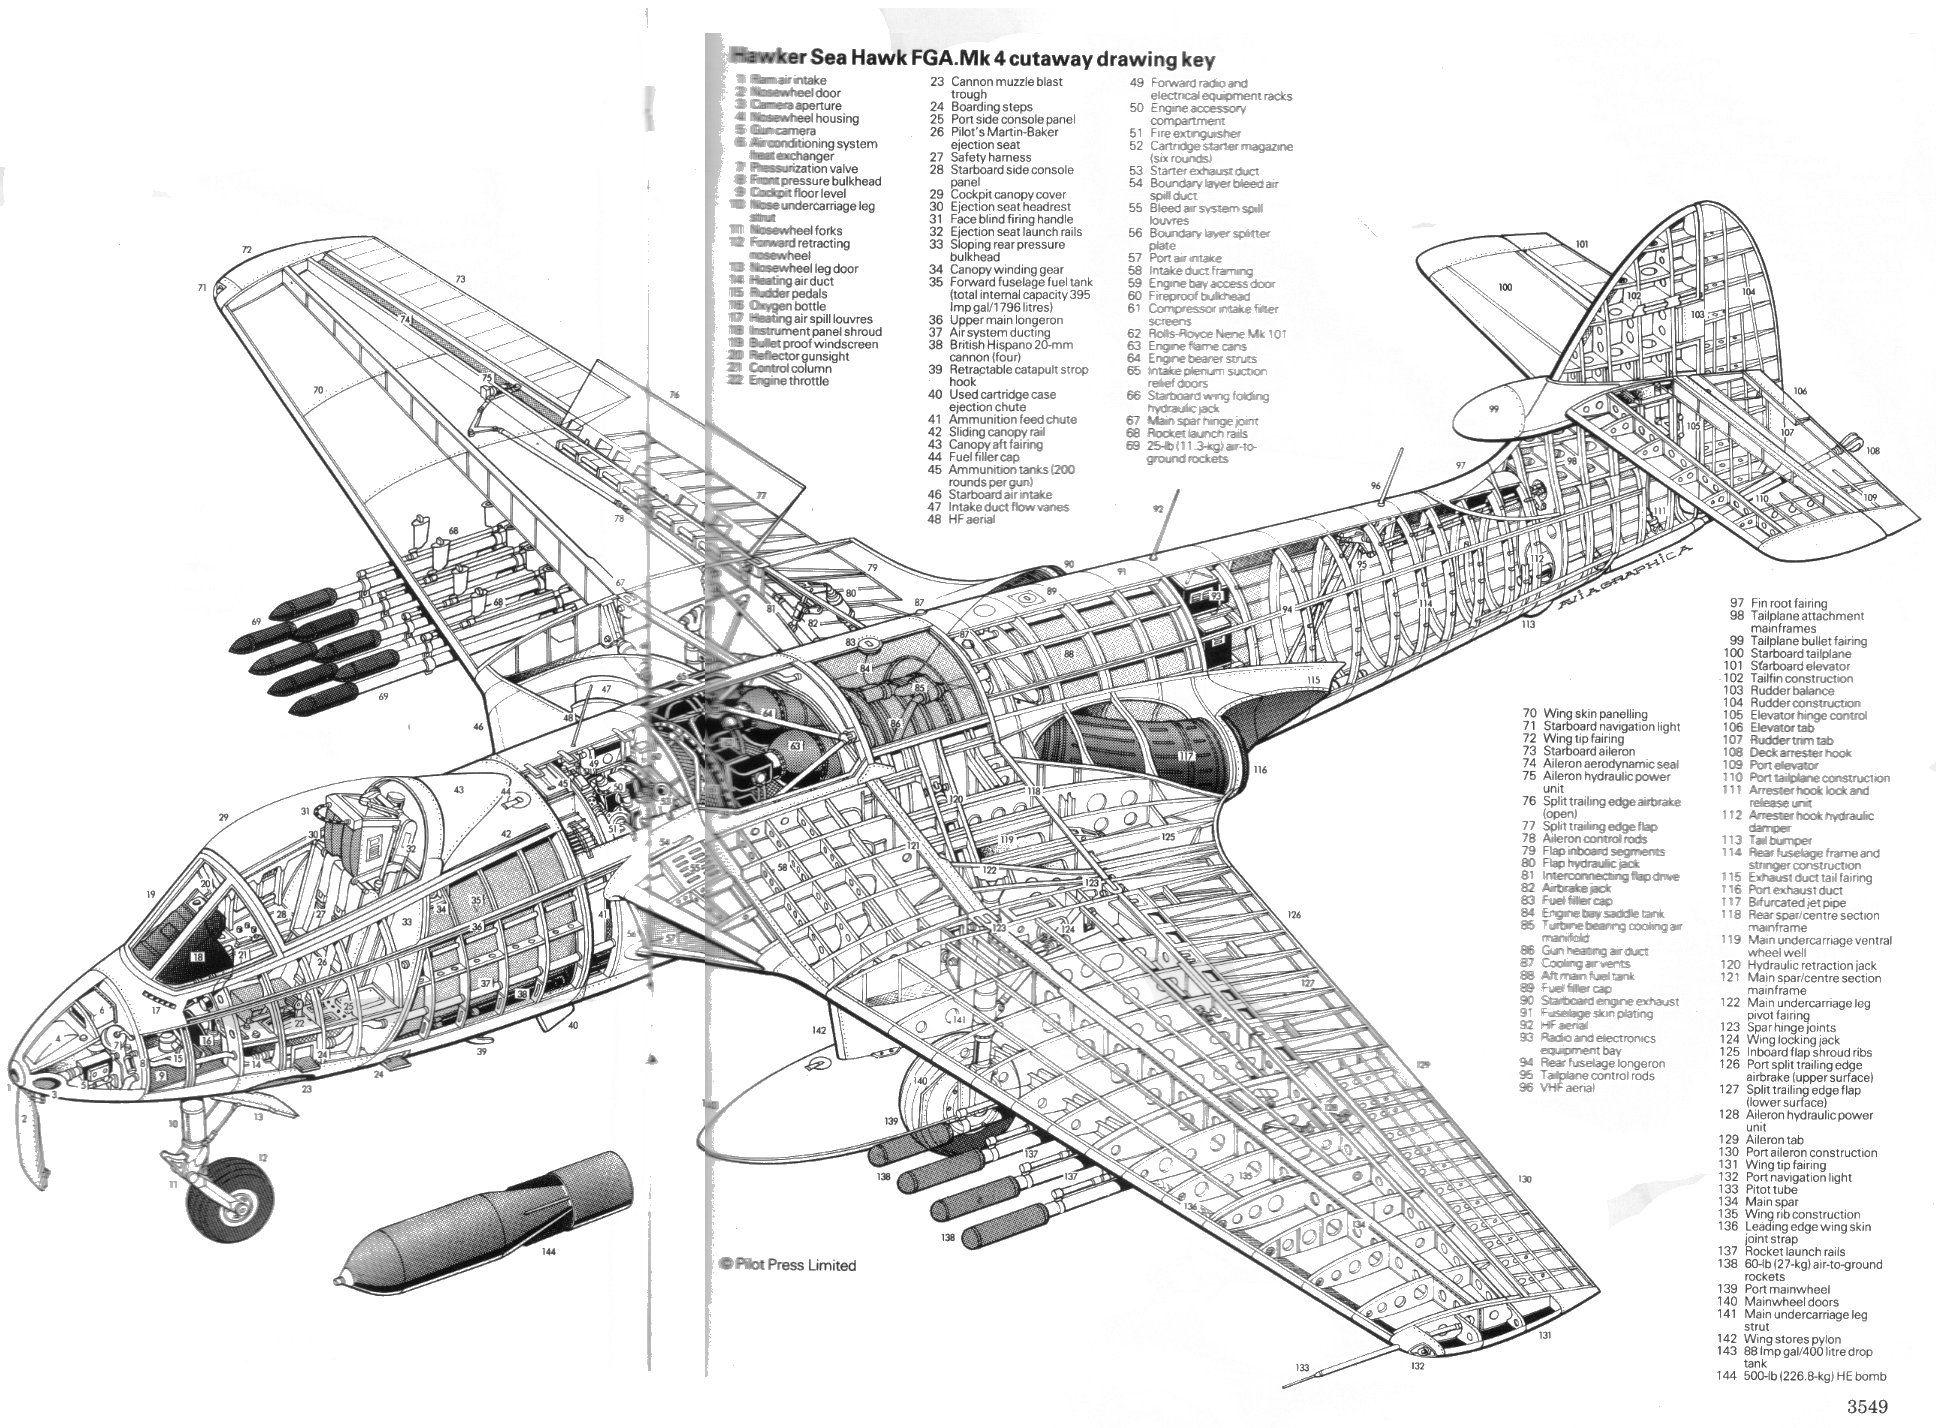 hawker sea hawk fga mk4 cutaway drawing key